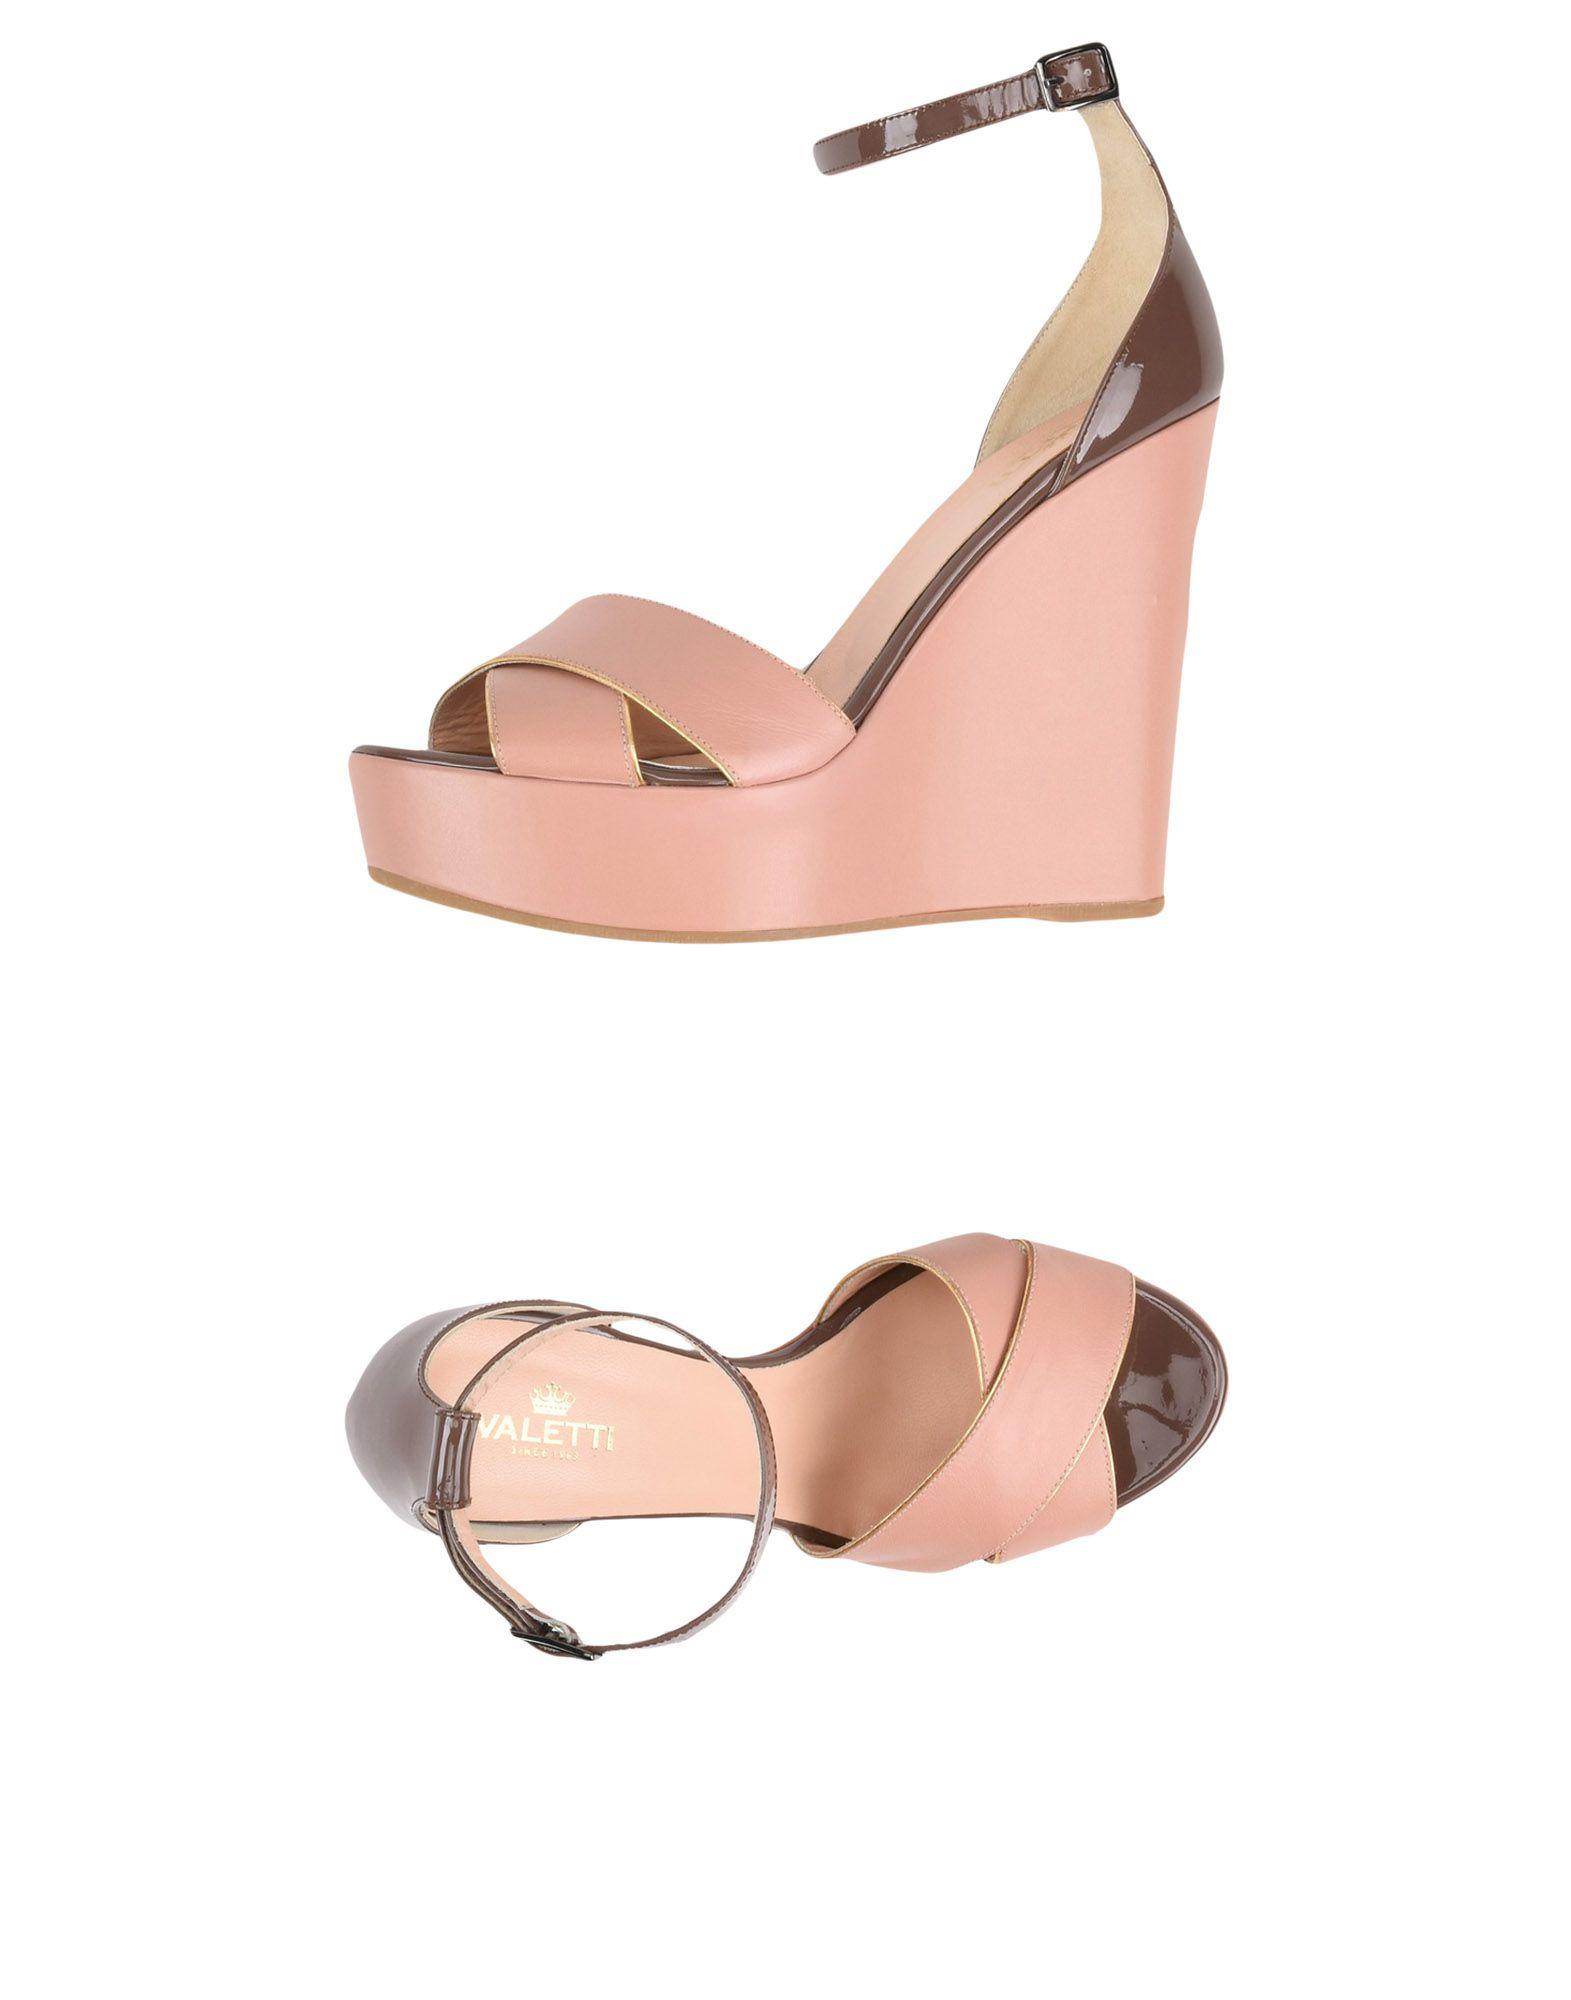 Moda Sandali Valetti Donna - 11474081GW